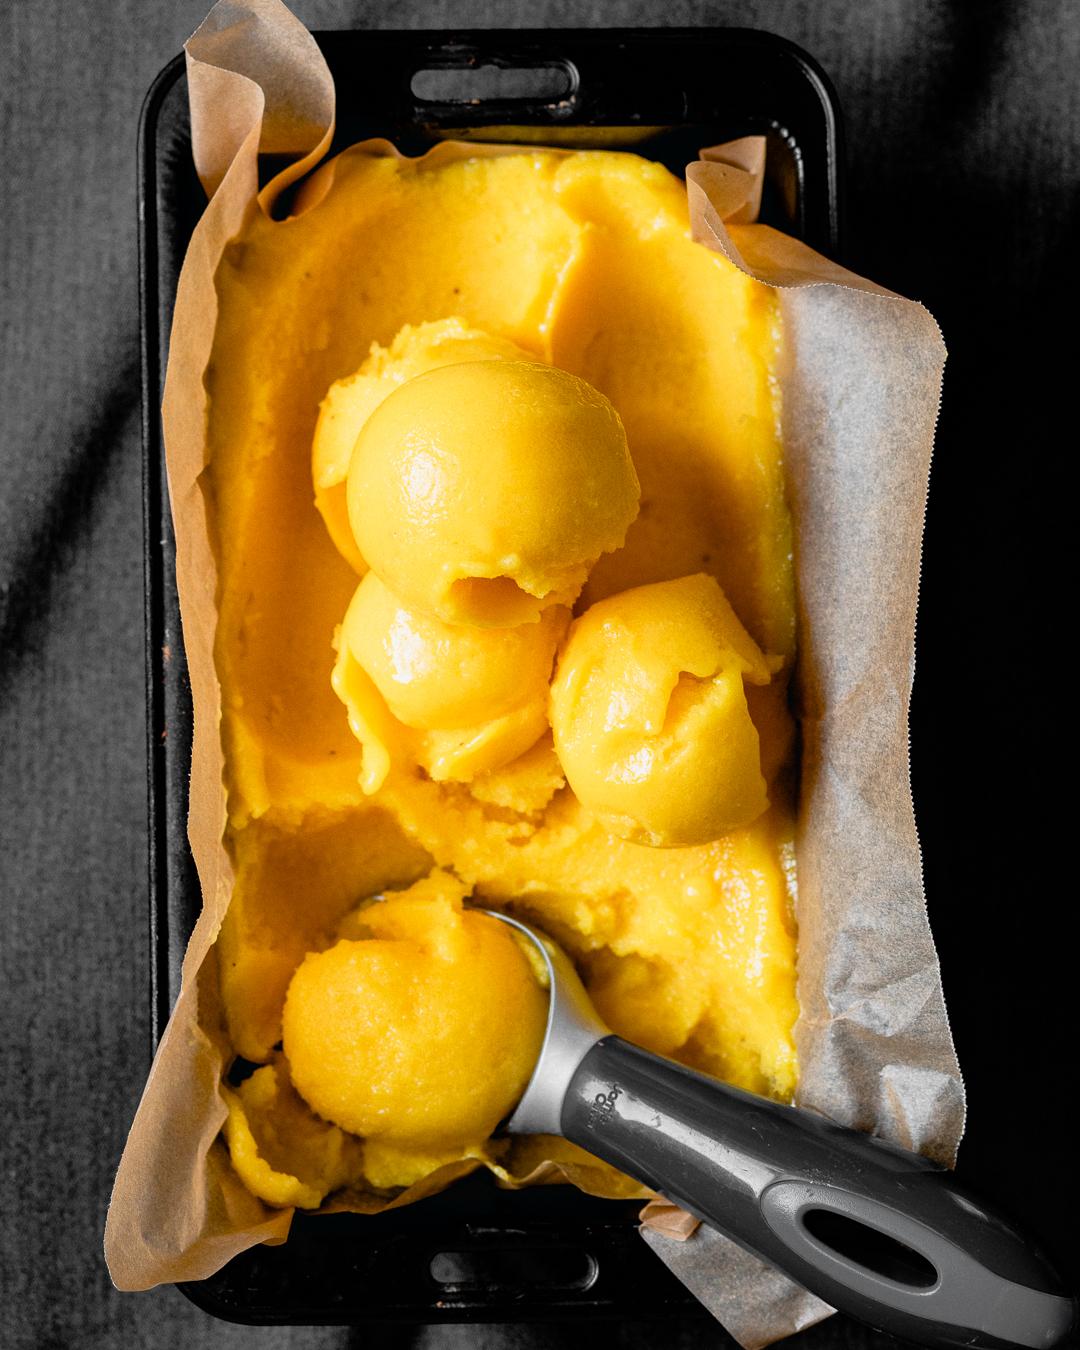 Probiotic_Mango_Sorbet_by_Jordan_Pie_Nutritionist_Photographer-2.jpg